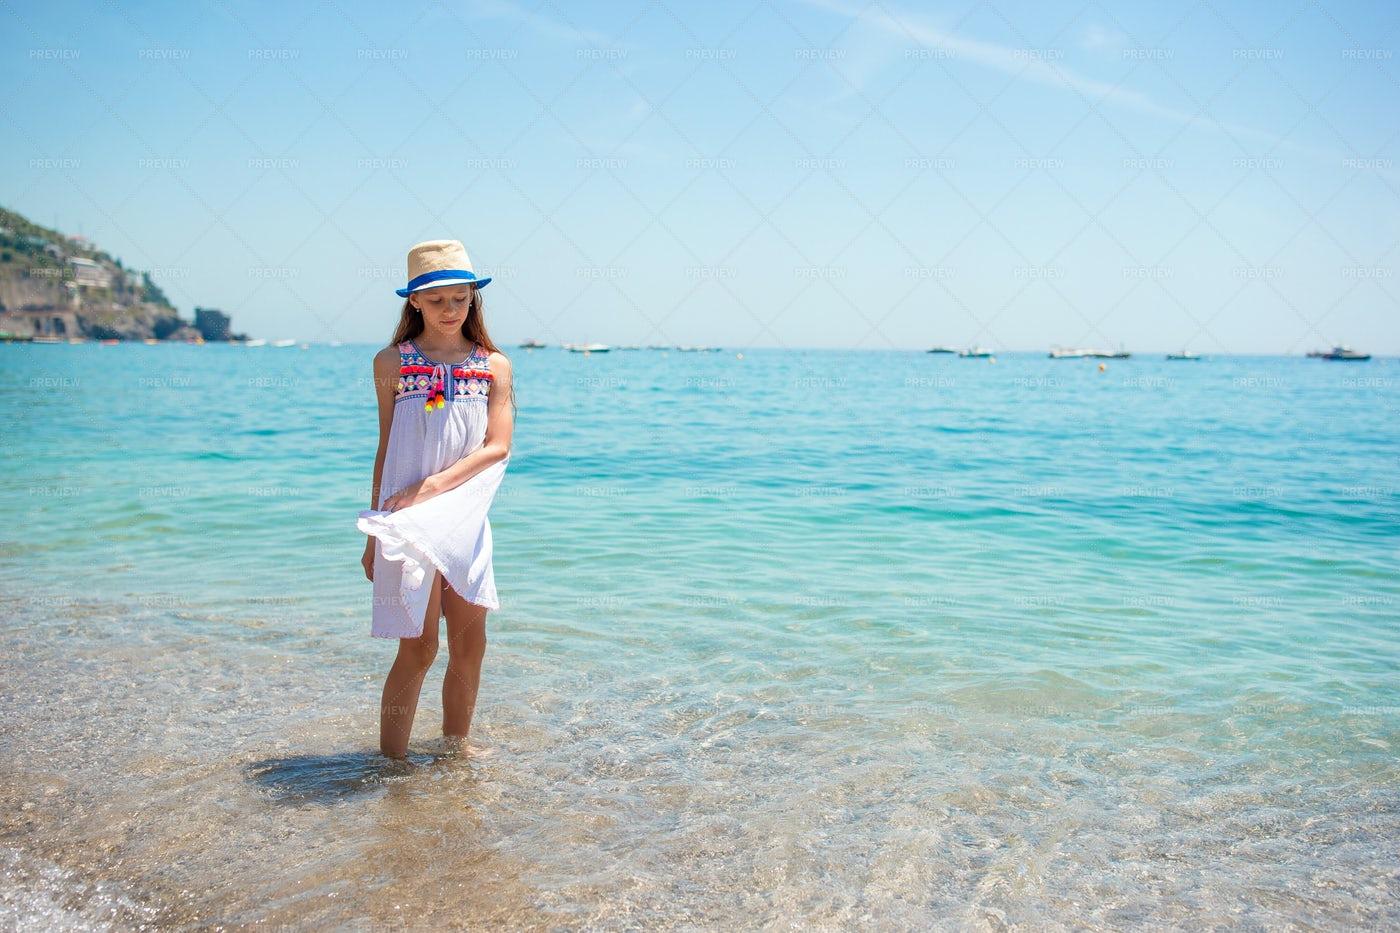 Little Girl And A Calm Beach: Stock Photos